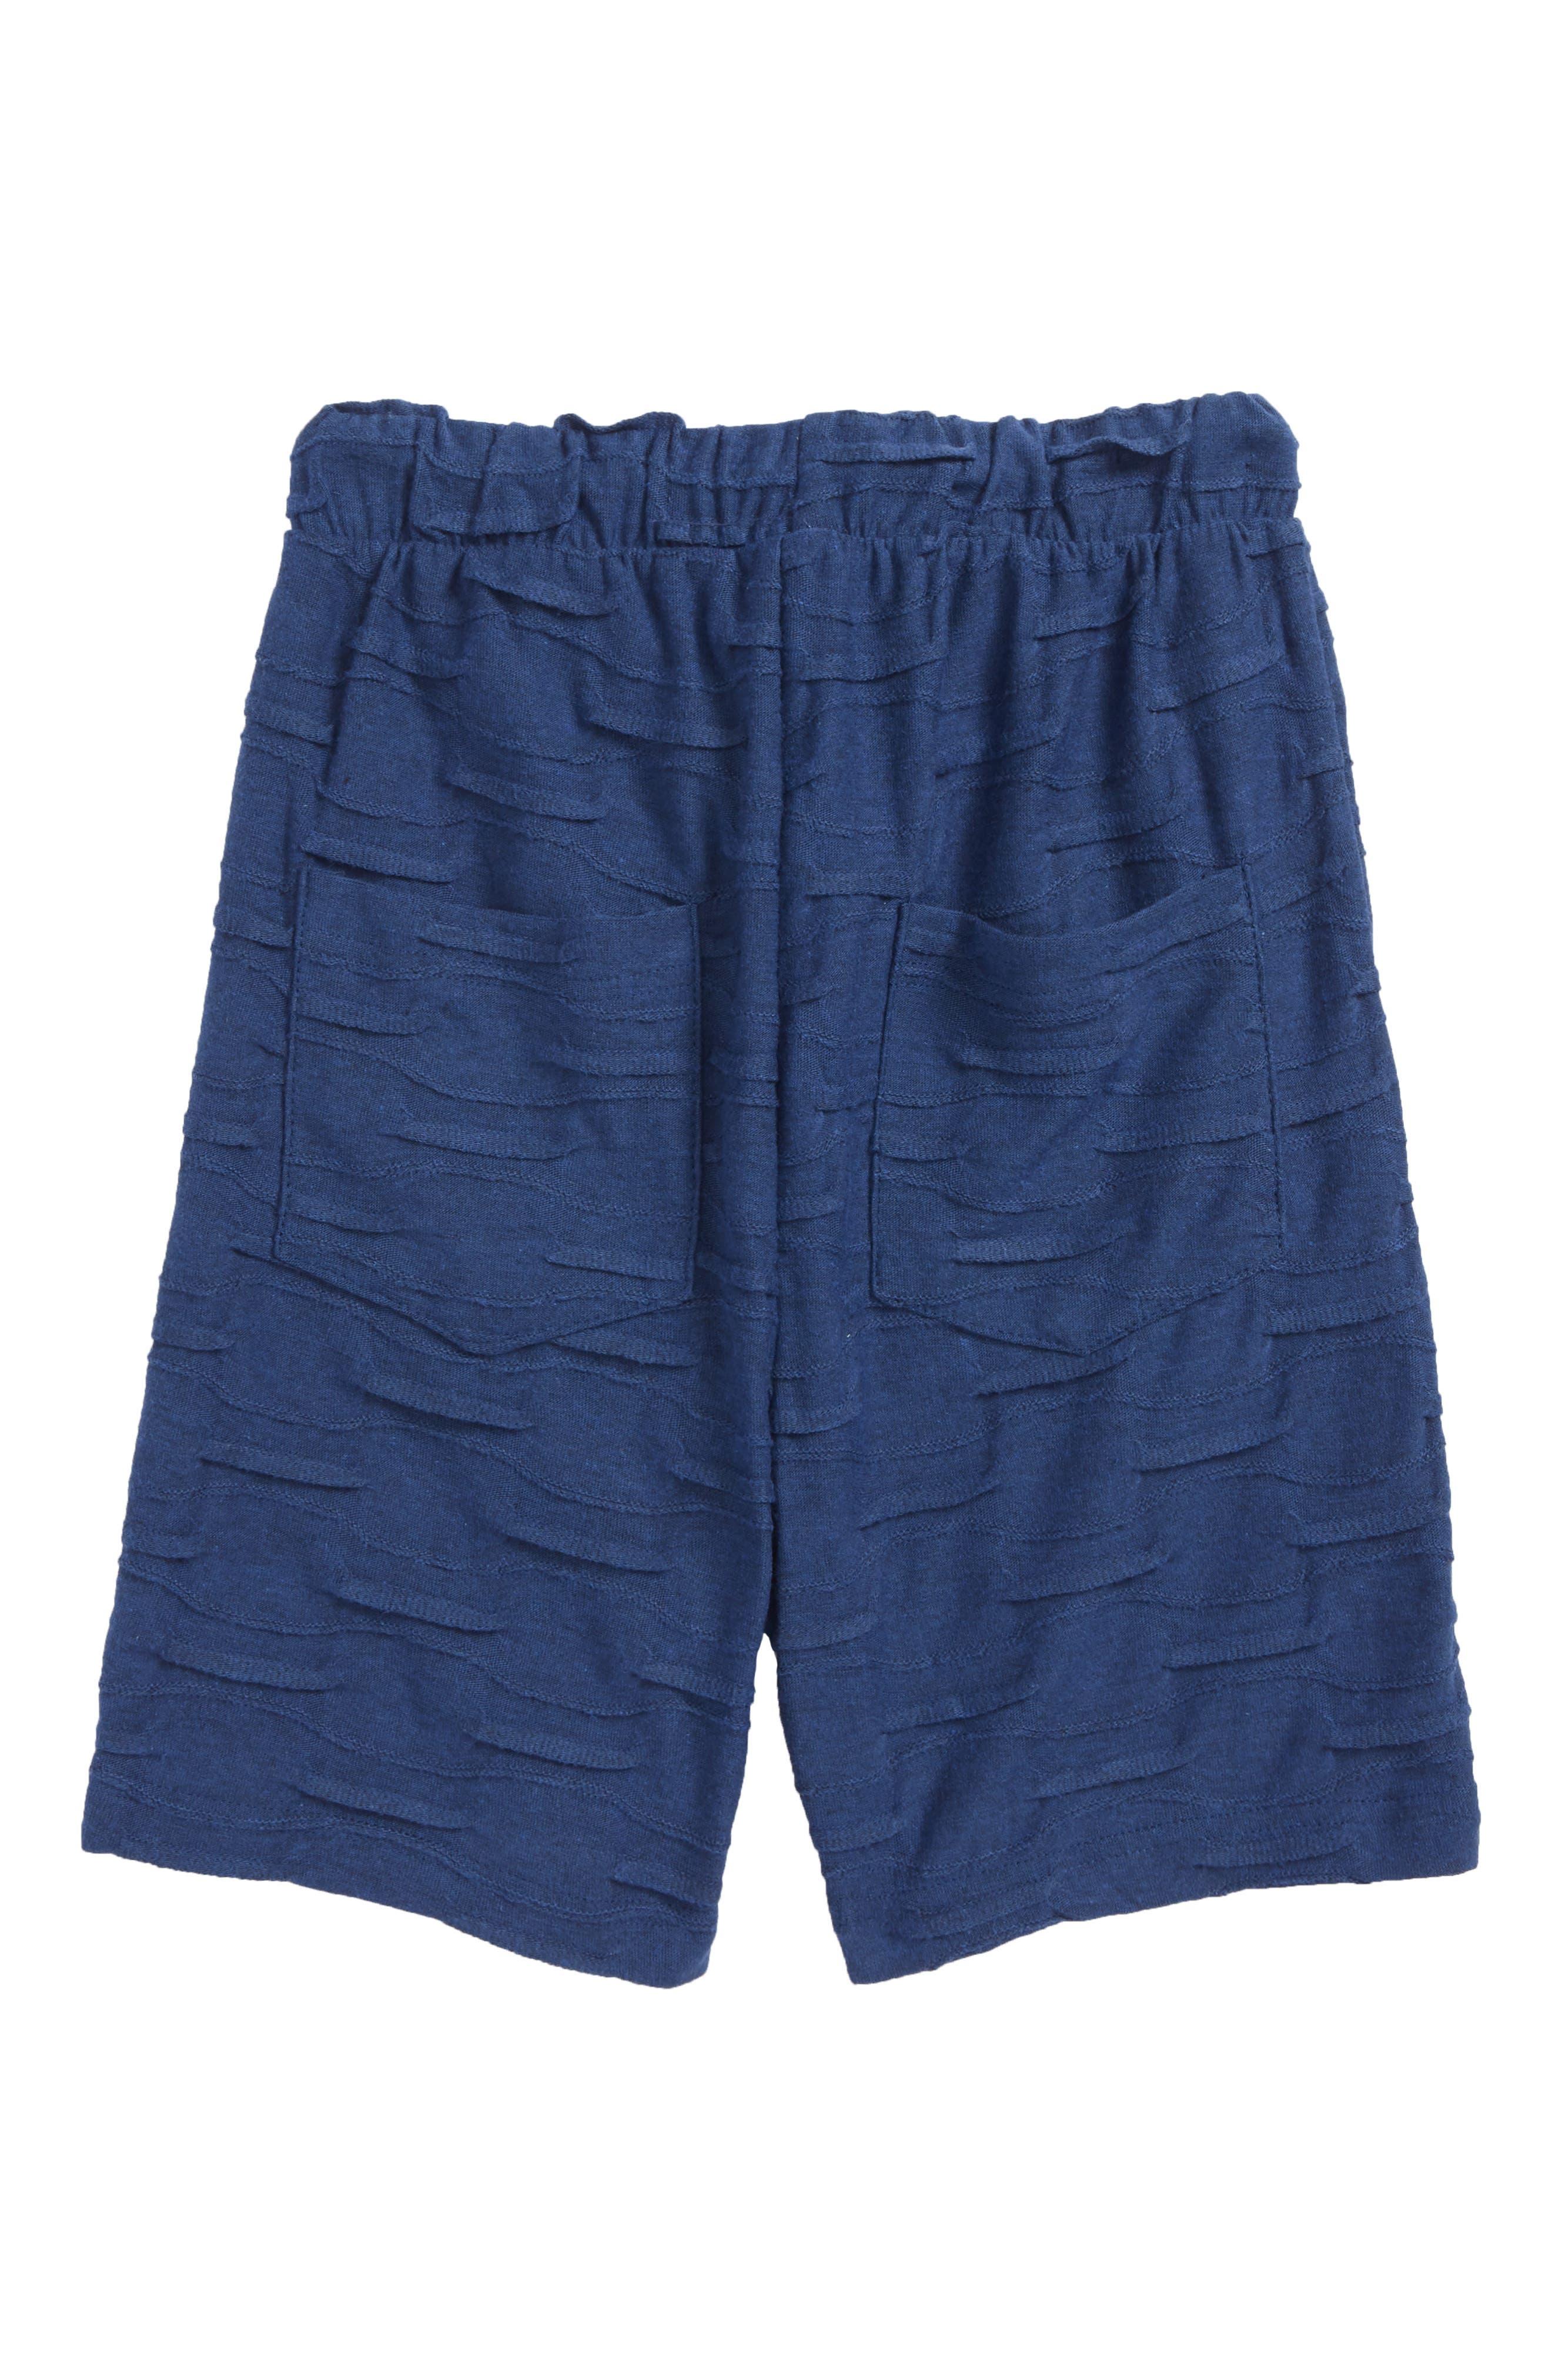 Cambria Shorts,                             Alternate thumbnail 2, color,                             Blue